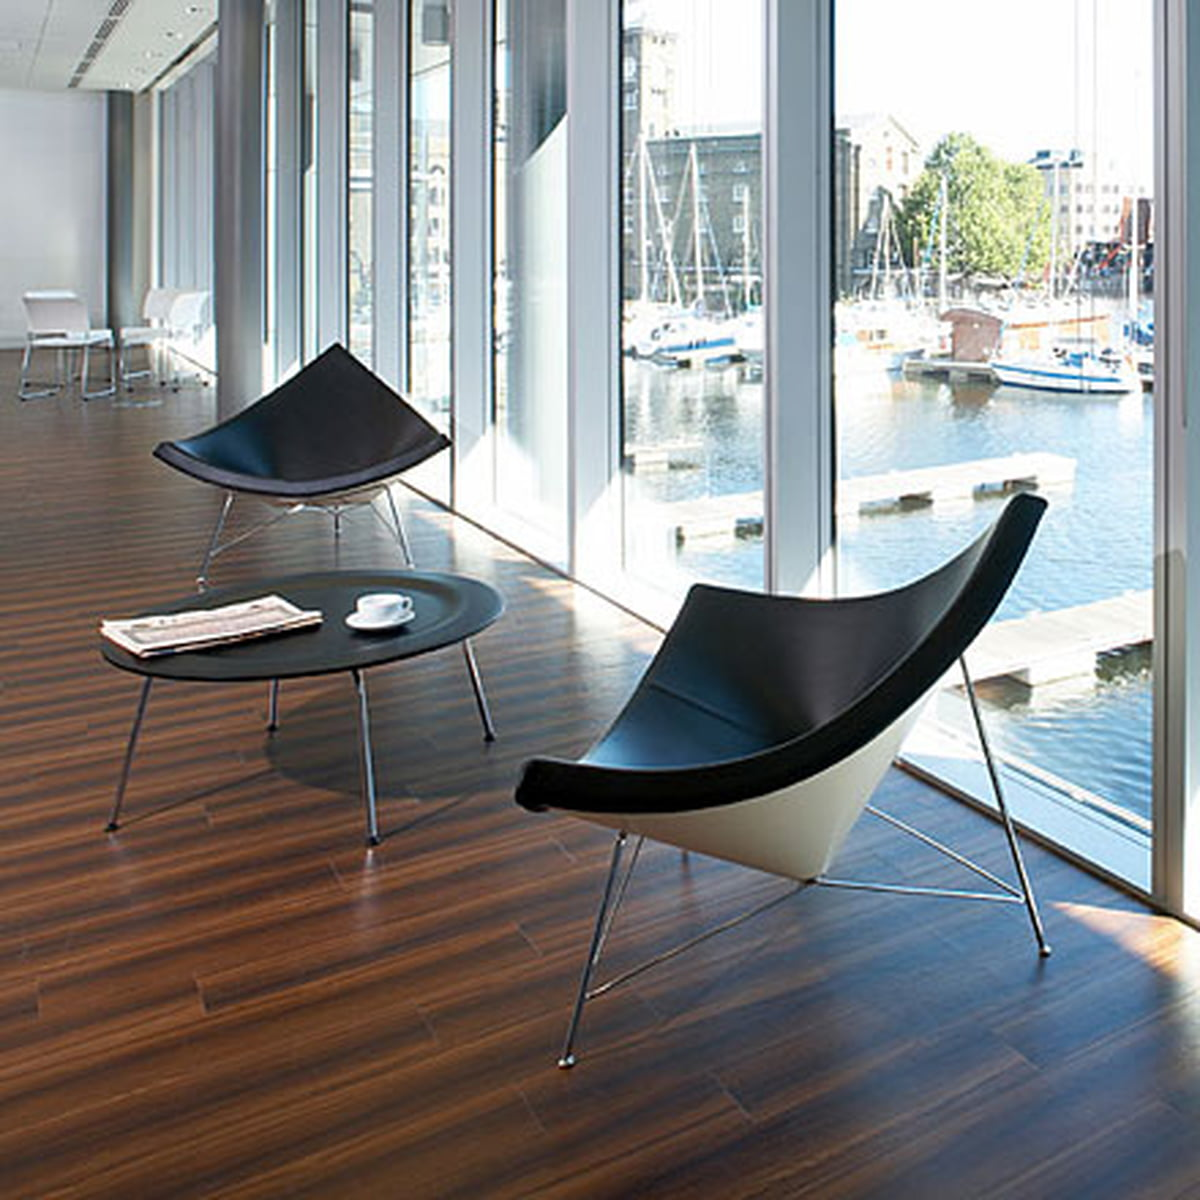 Coconut chair vitra shop for Vitra sessel replica